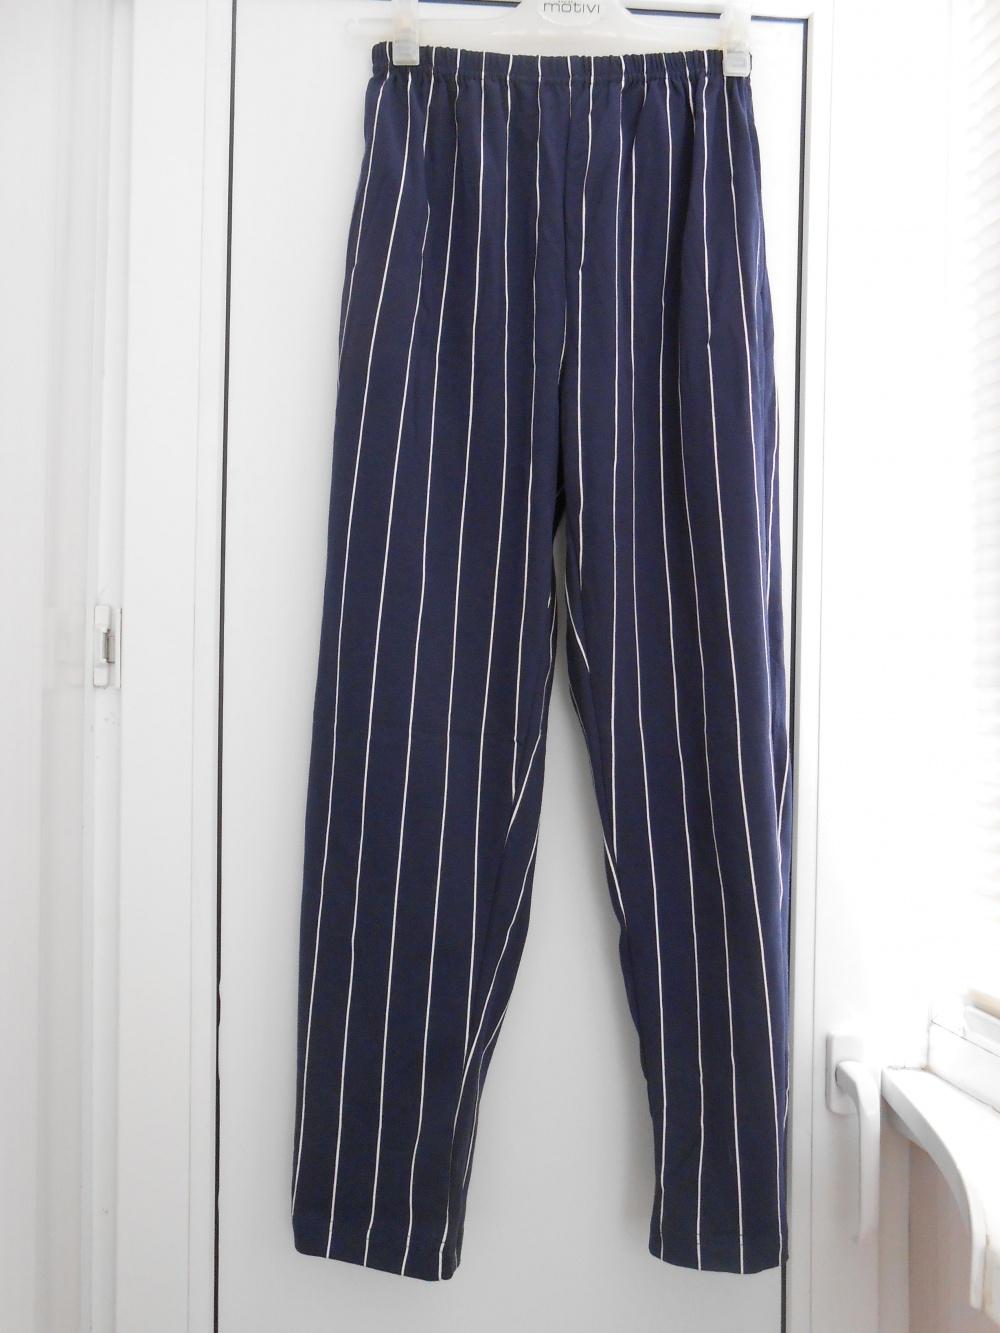 Домашний костюм ( пижама ) SEIN р. 44 - 46